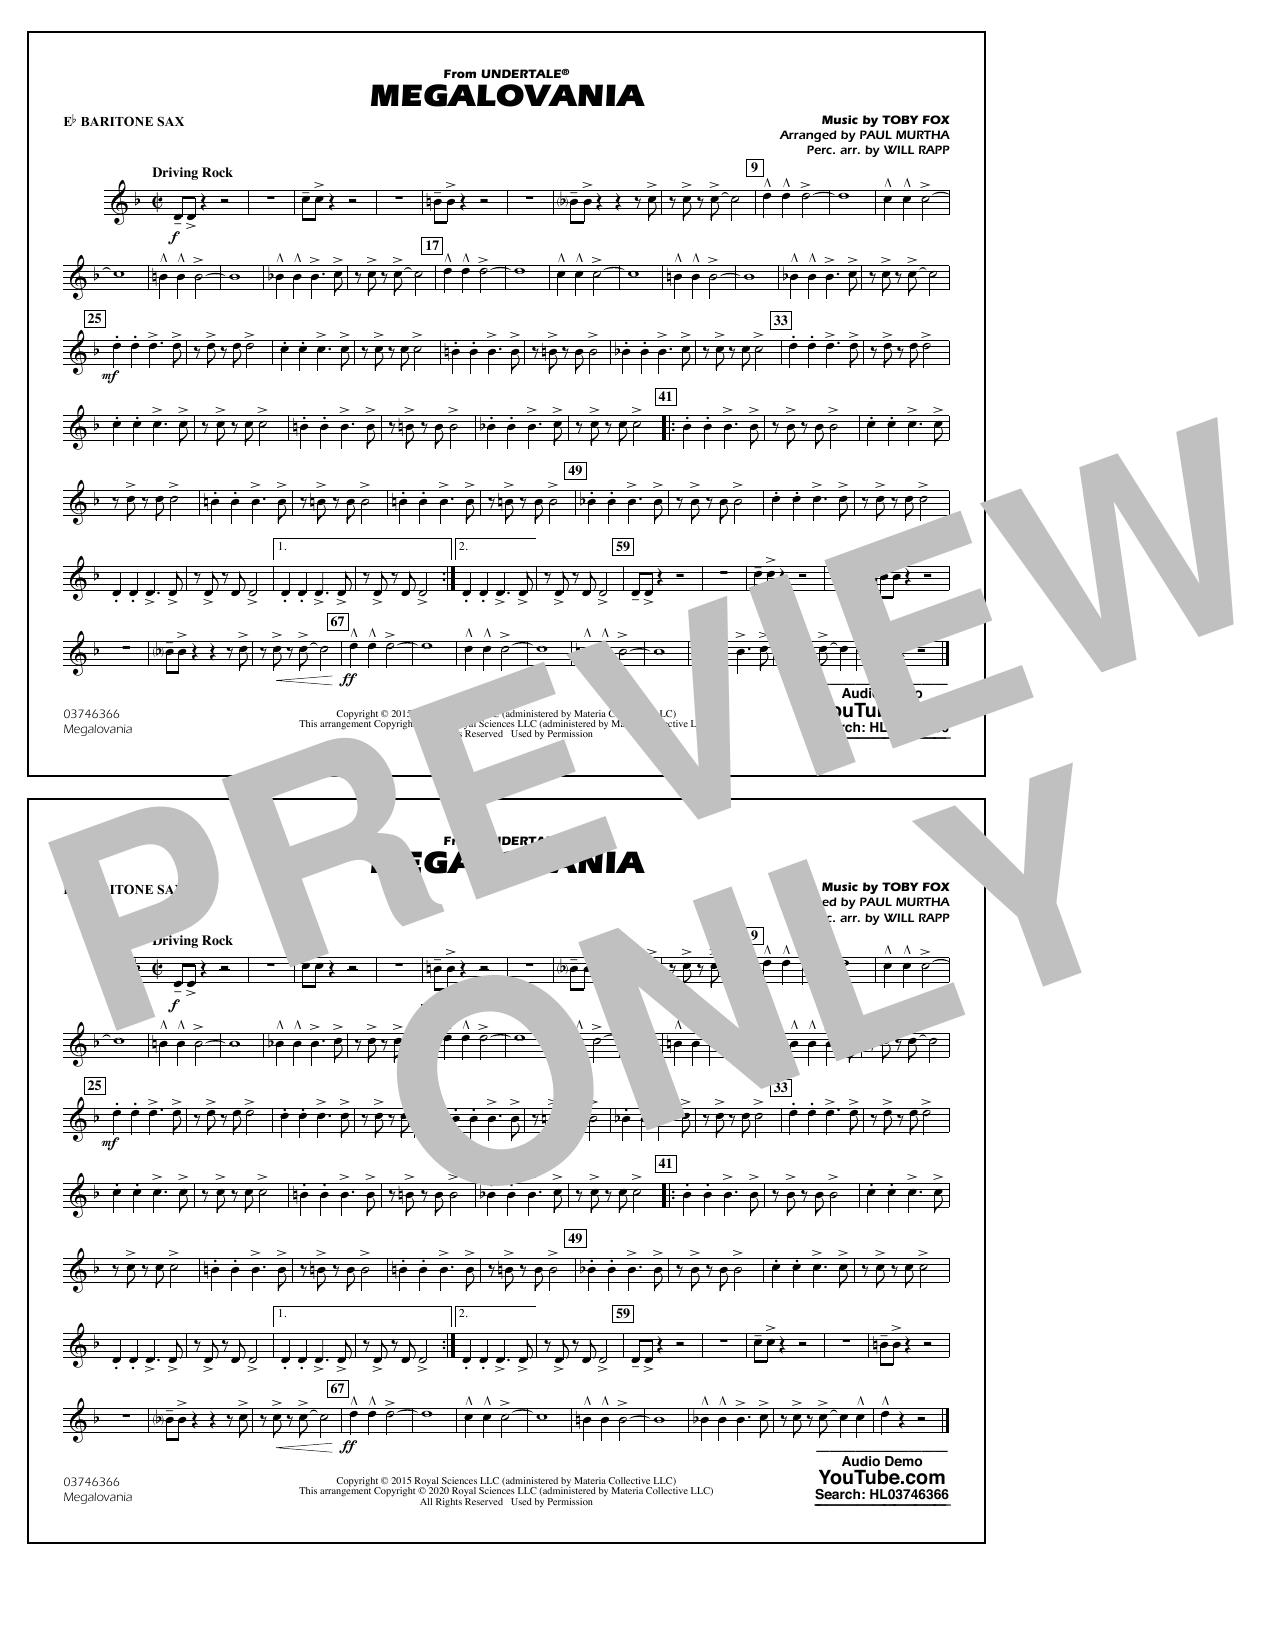 Megalovania (from Undertale) (arr. Paul Murtha) - Eb Baritone Sax Sheet Music